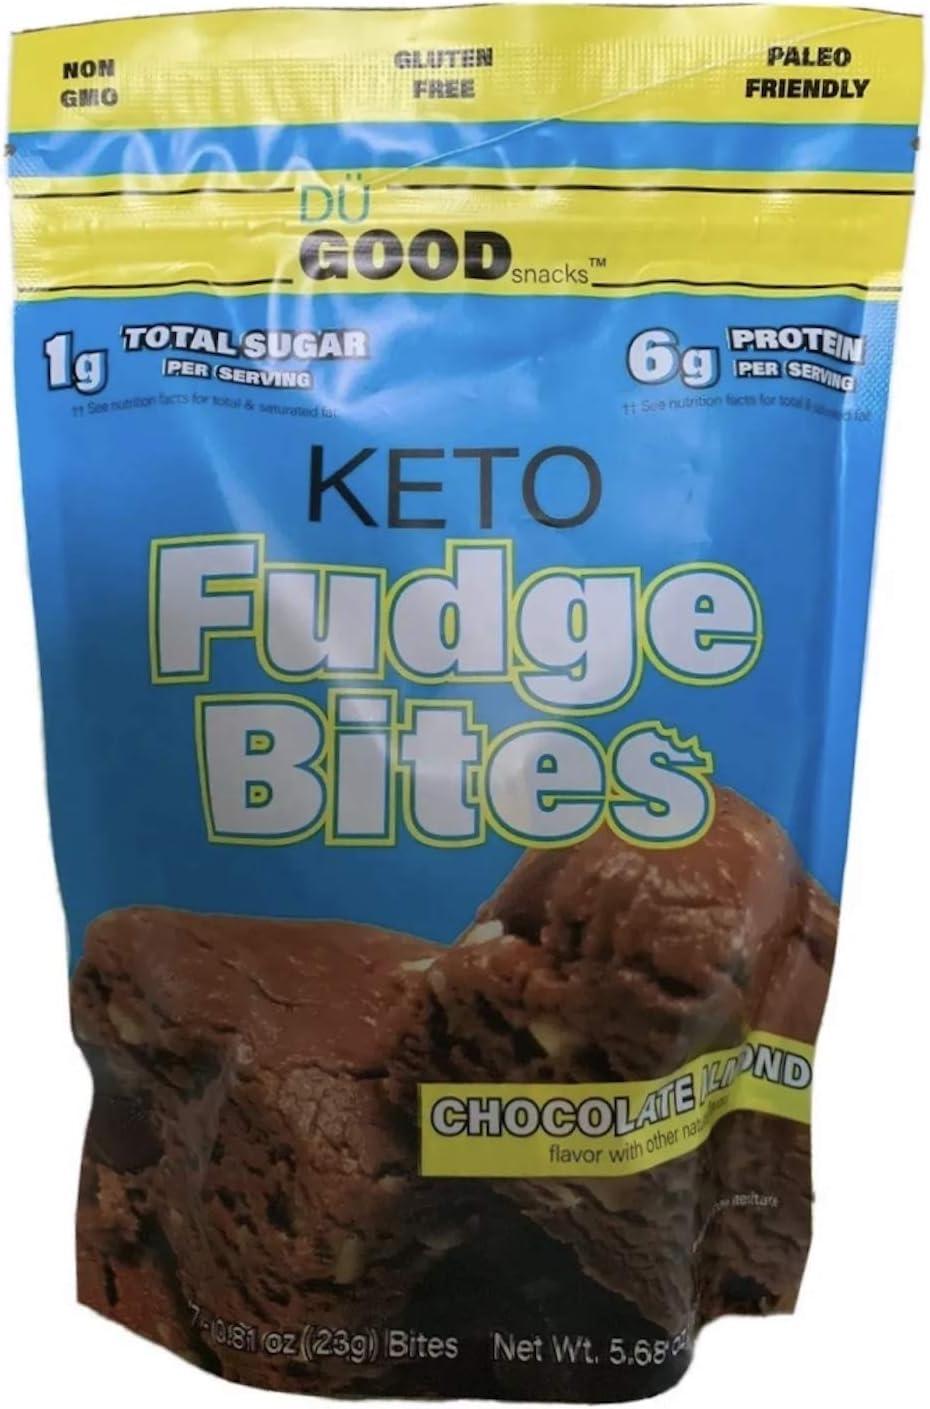 Keto Fudge Ranking TOP2 Bites Wholesale - Delicious to-go N Low-Carb Snacks Chocolate